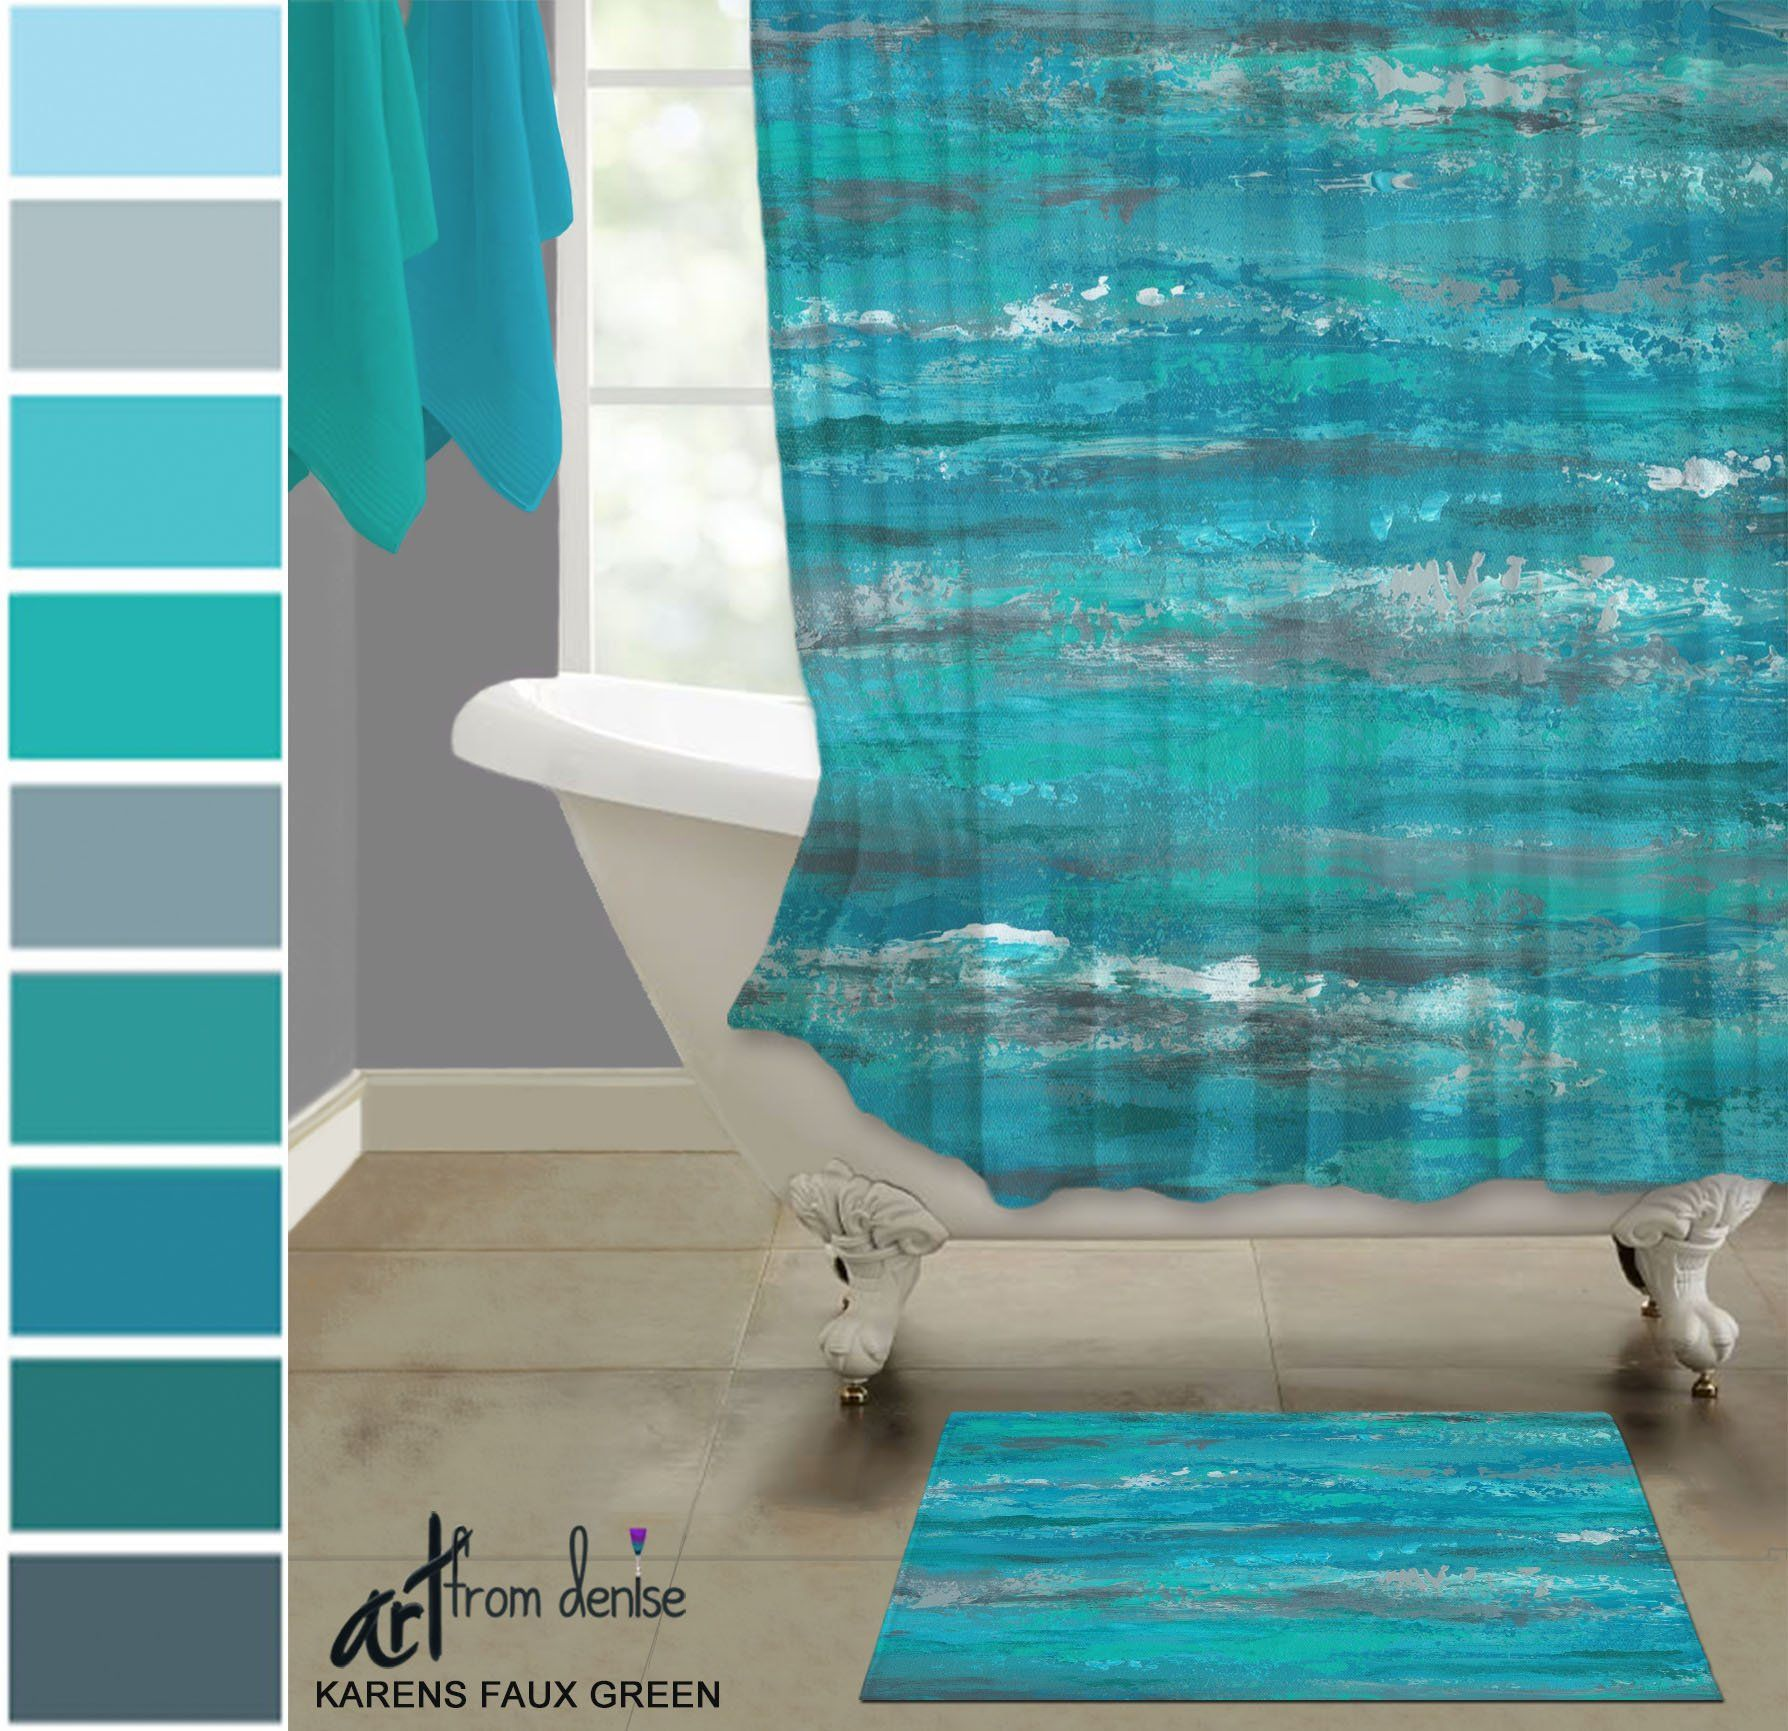 Aqua Gray And Teal Shower Curtain Bath Mat Sets Modern Abstract